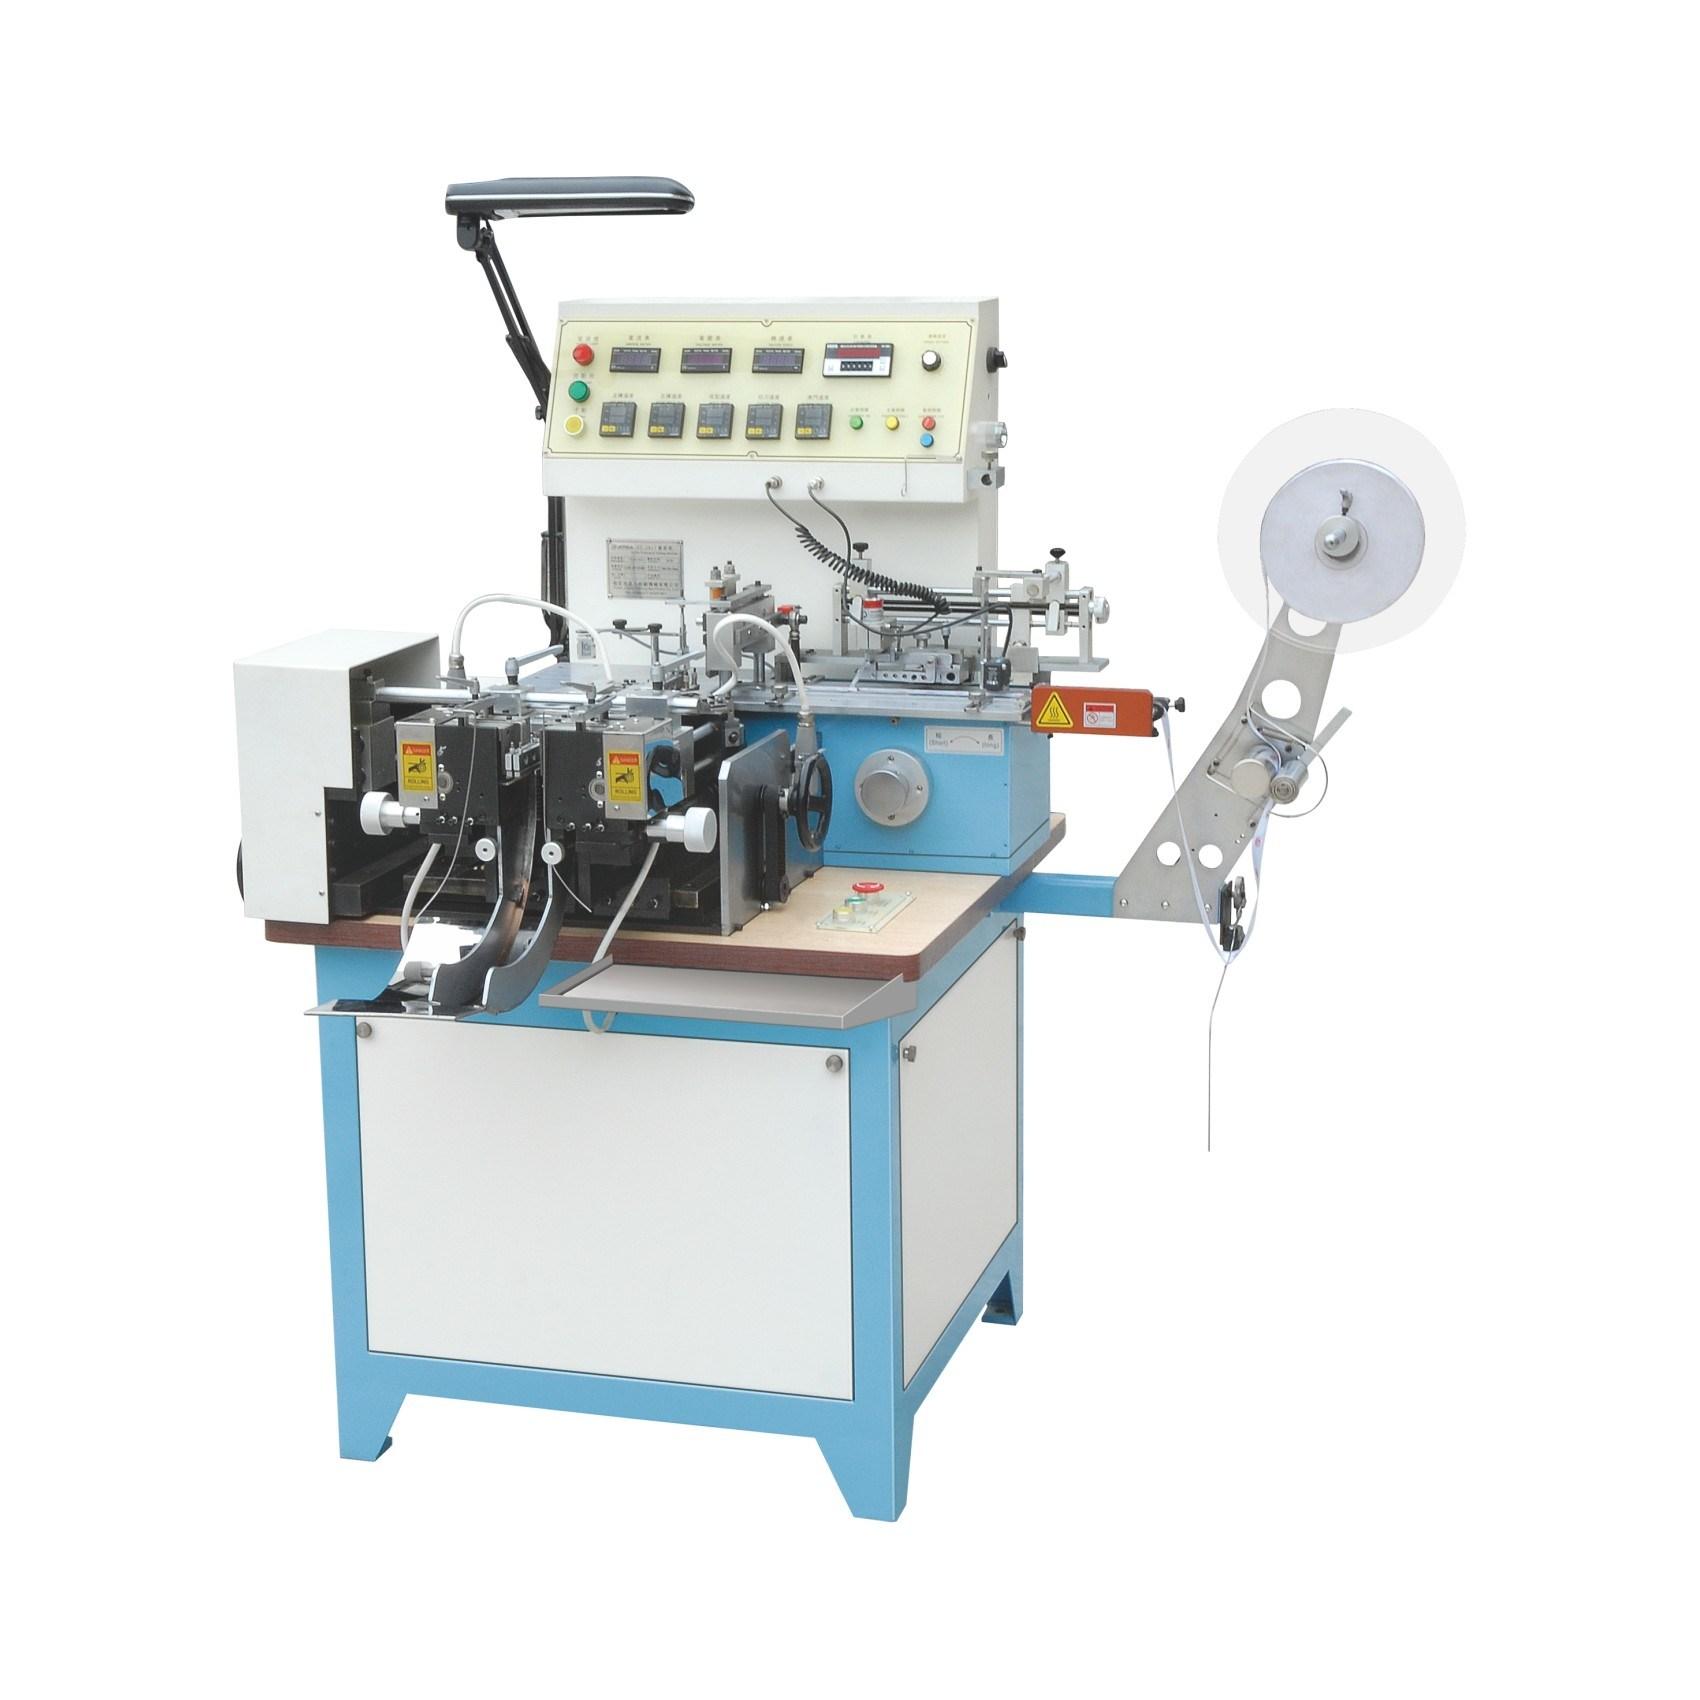 China Label Cutting and Folding Machine for Silk Ribbon Clothing Wash Care  Label Jzb-2817 - China Cutting Machine, Label Cutting and Folding Machine